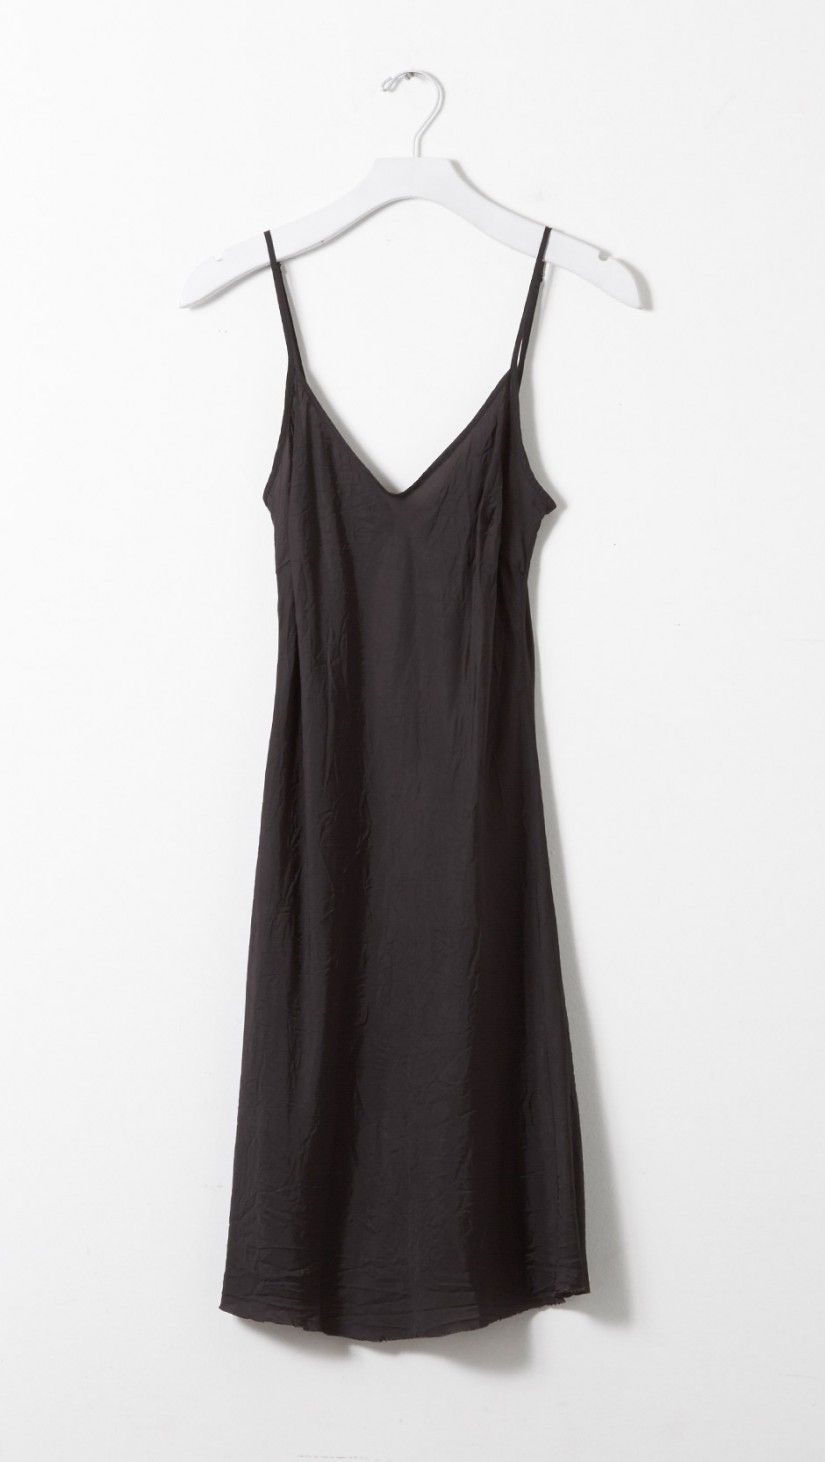 57551515e2c8a Black · Organic by John Patrick Short Slip Dress in Shadow